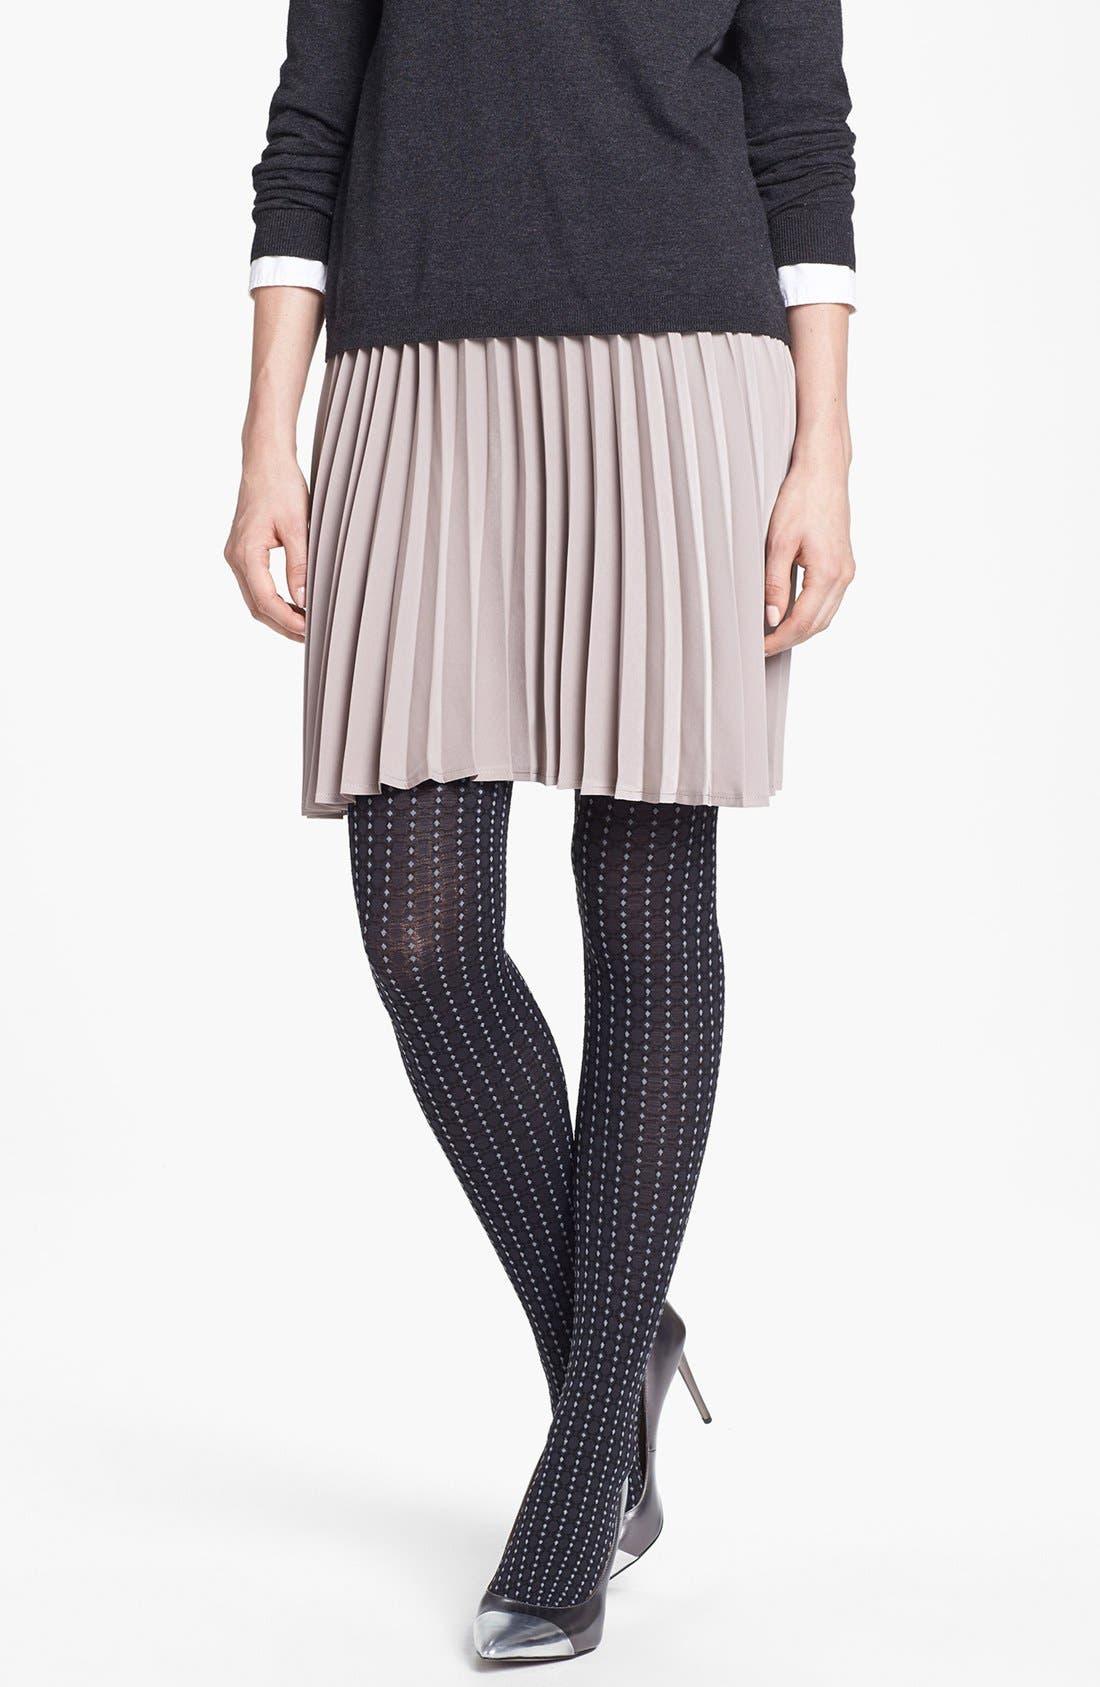 Main Image - DKNY 'Menswear Foulard' Tights